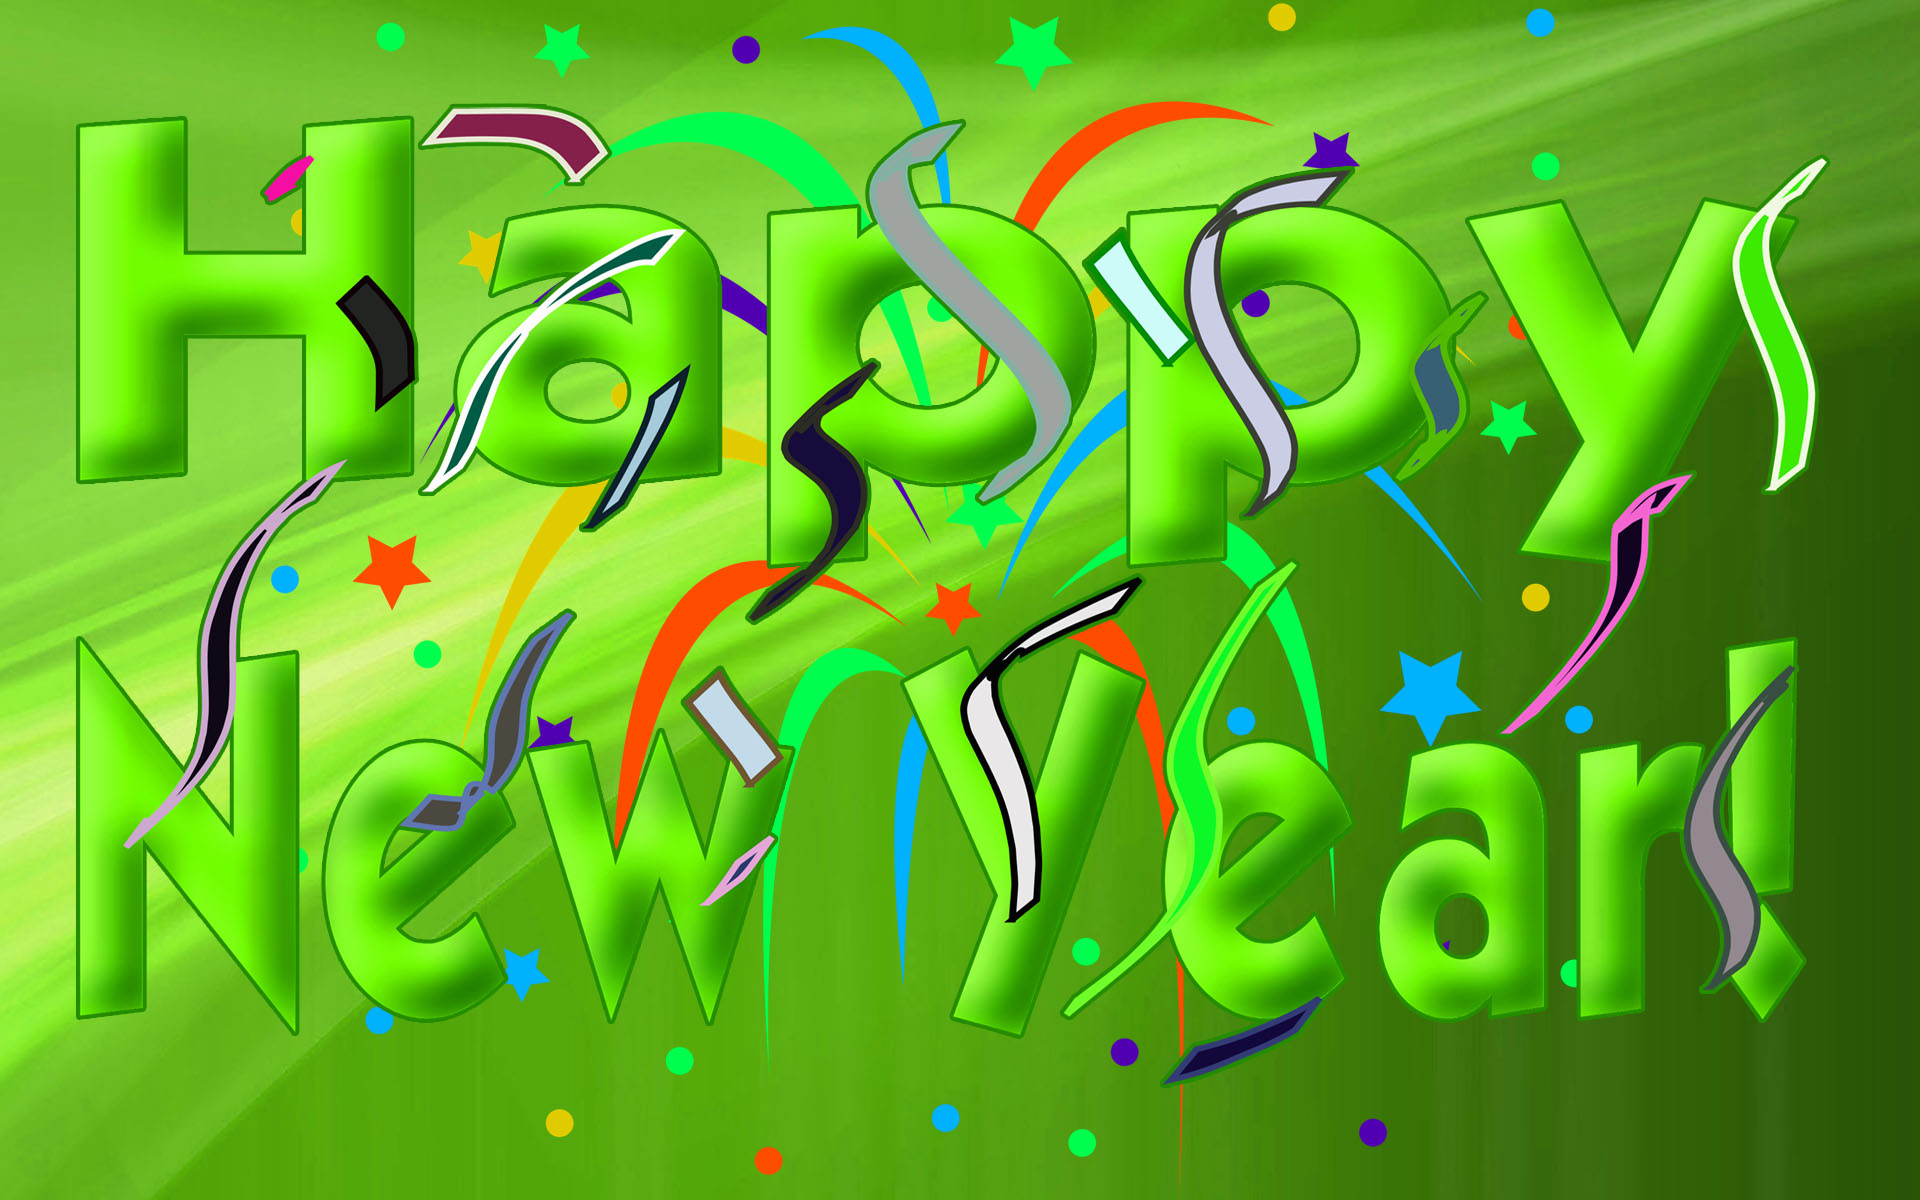 Happy New Year Hd Wallpaper Download - Happy New Year 2018 Best - HD Wallpaper